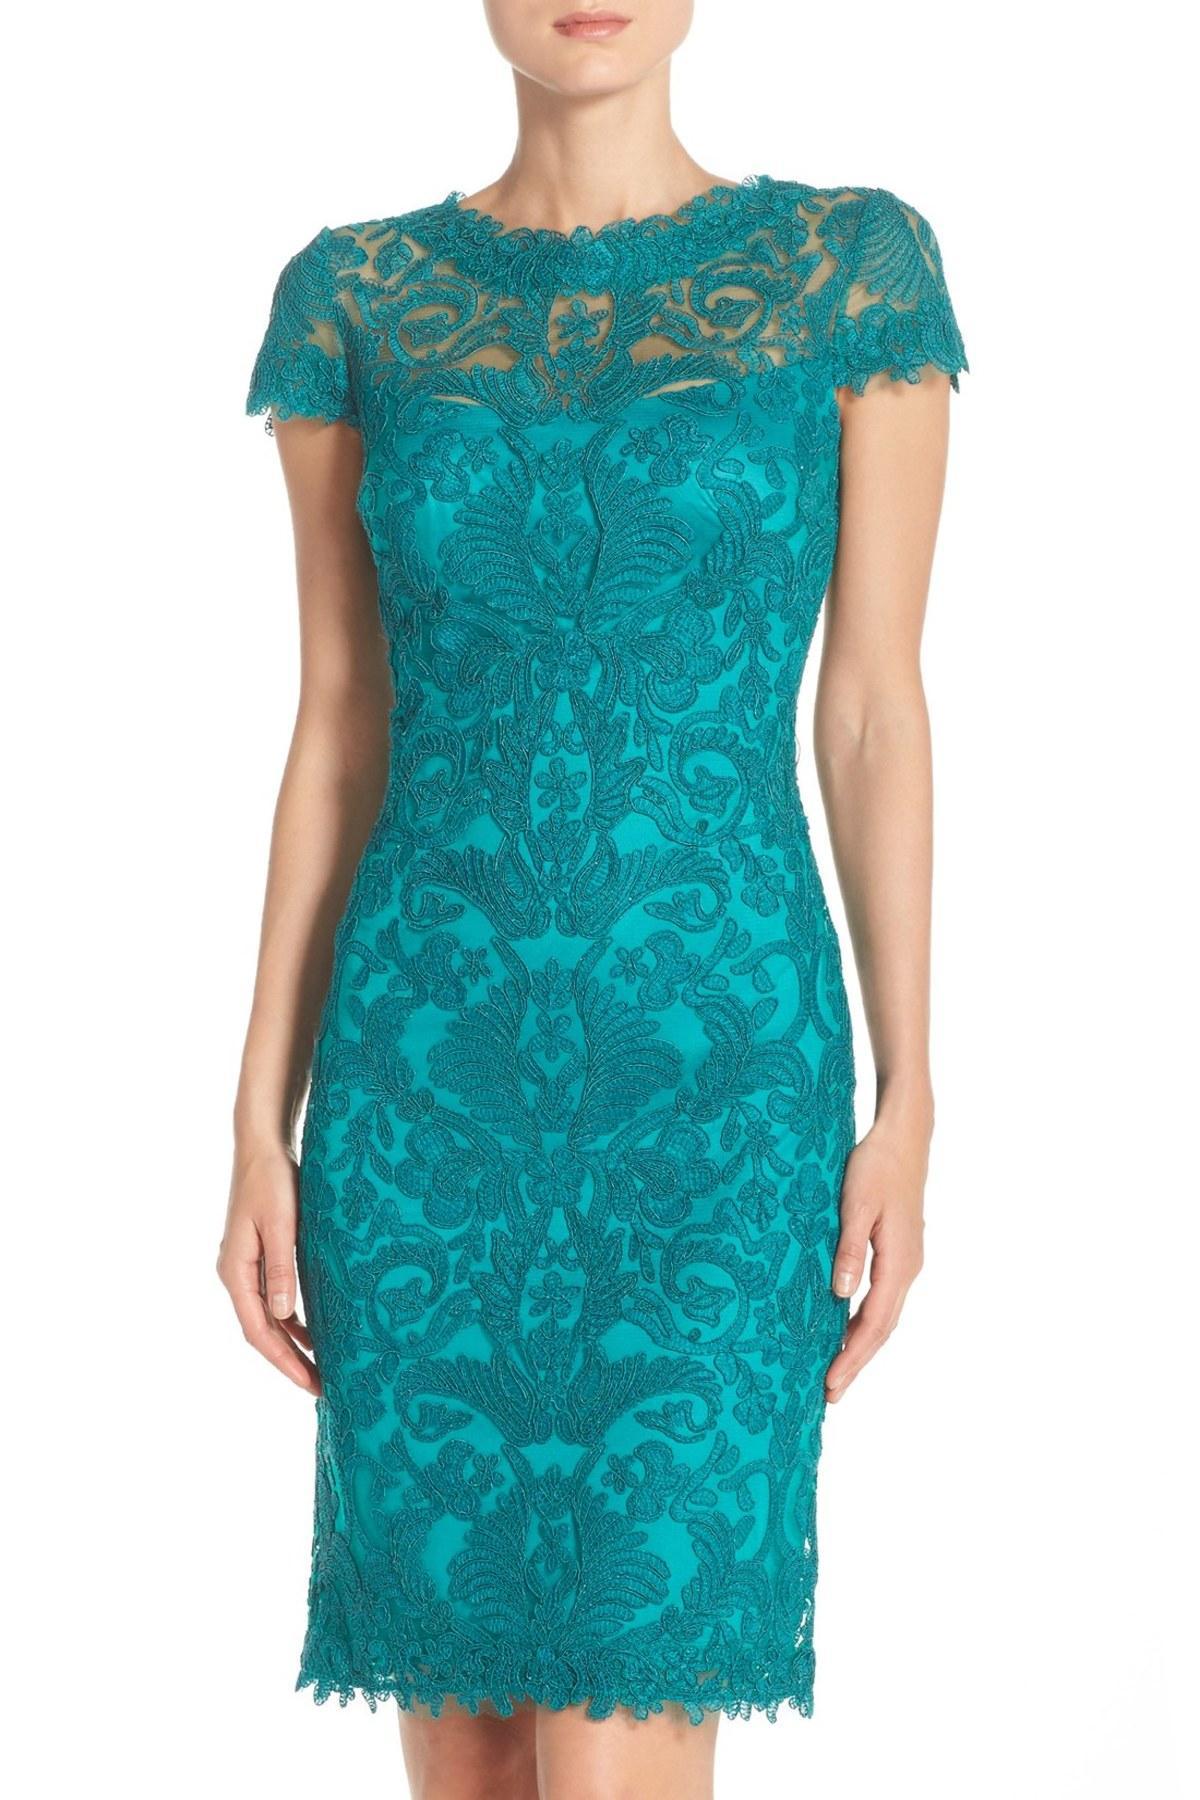 Lyst - Tadashi Shoji Illusion Yoke Lace Sheath Dress in Blue